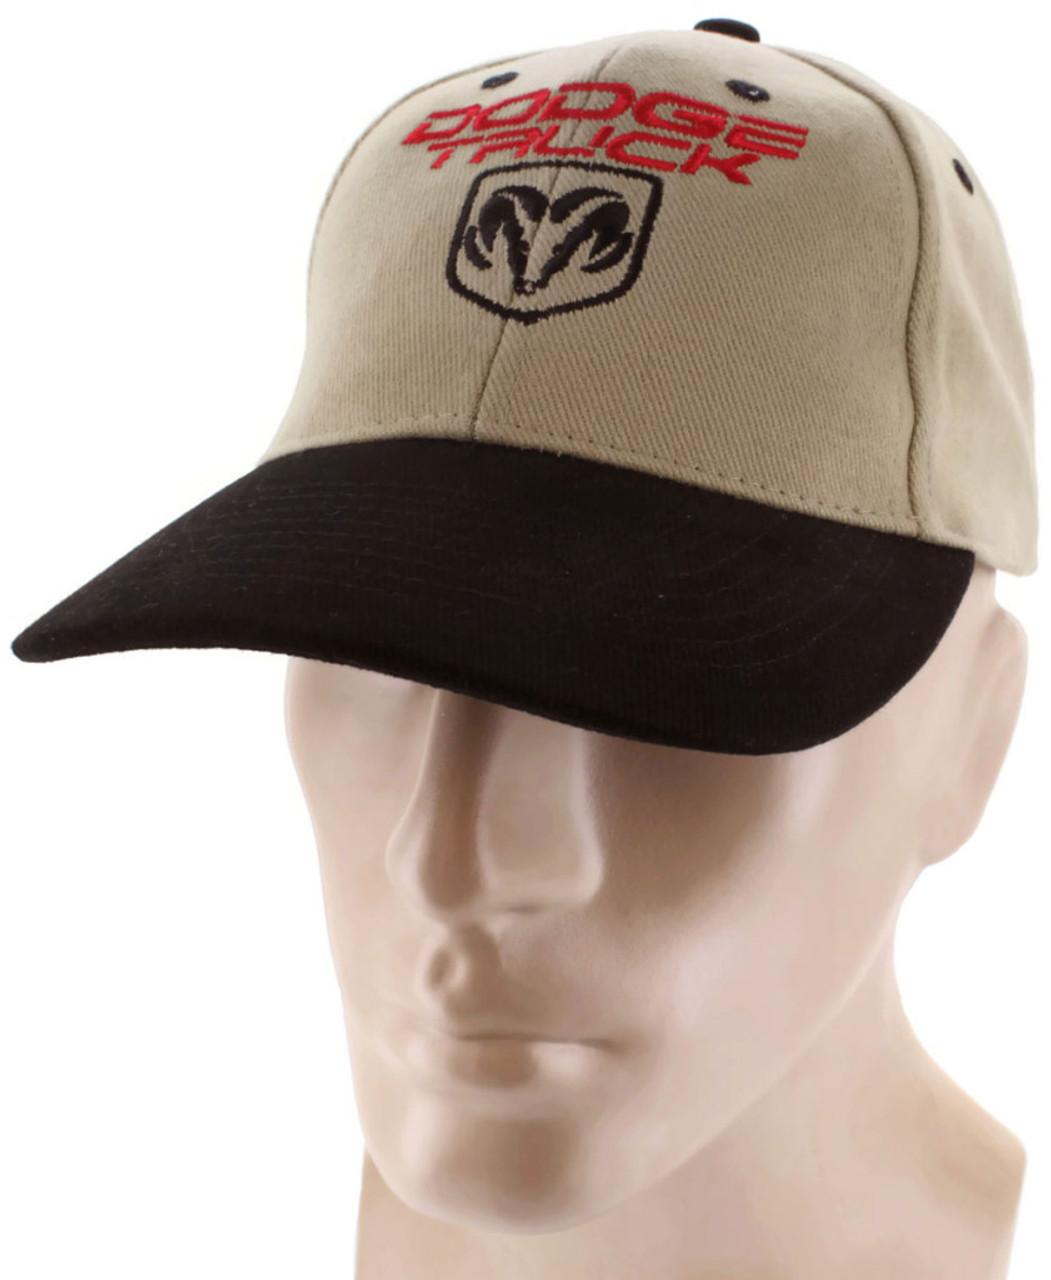 Dodge Truck Black Khaki Baseball Cap Trucker Hat Snapback Ram 1500 ... 768769f9d72